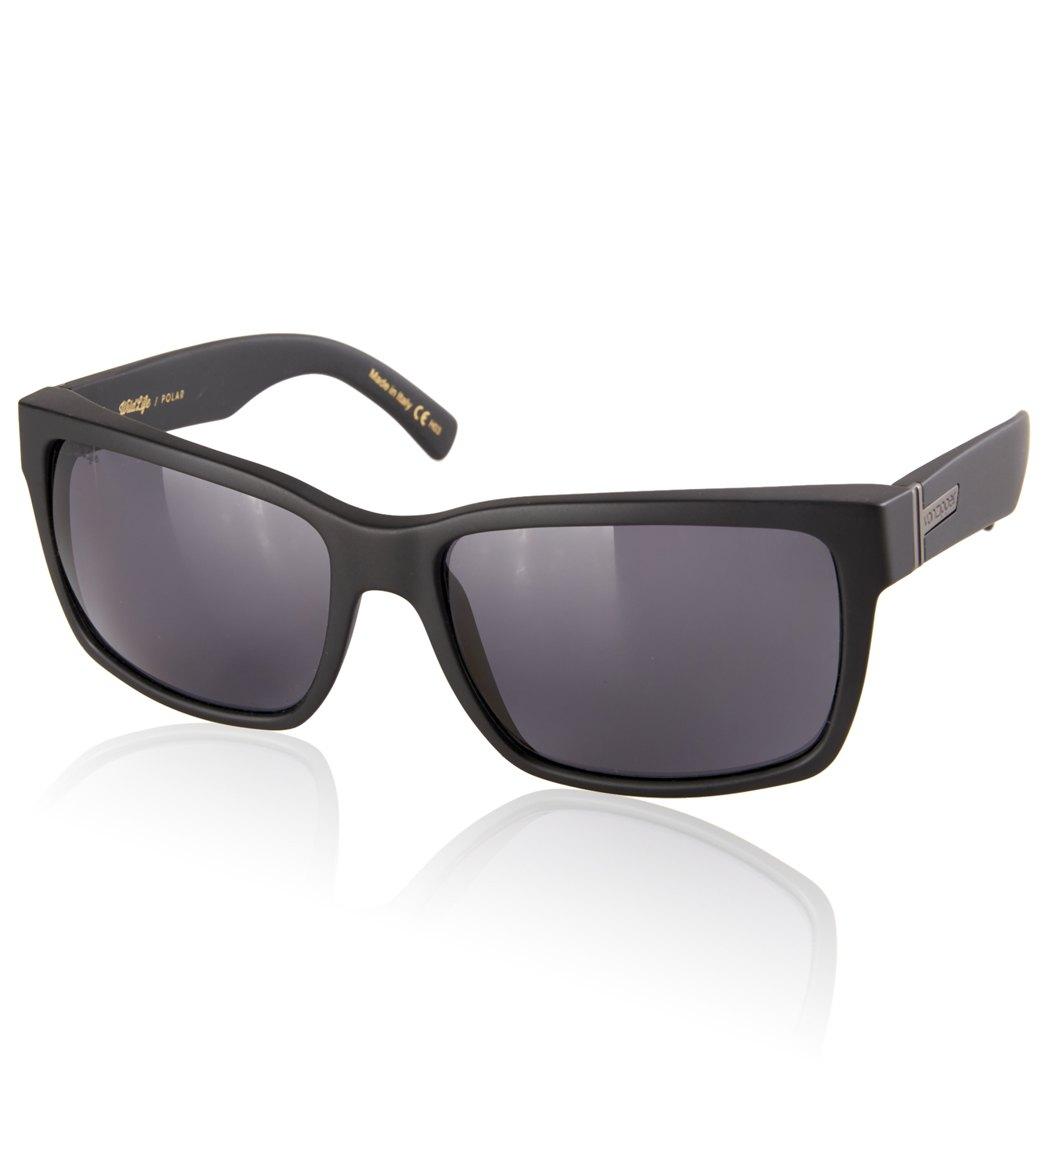 b8eba45896 Von Zipper Elmore Polarized Sunglasses at SwimOutlet.com - Free Shipping